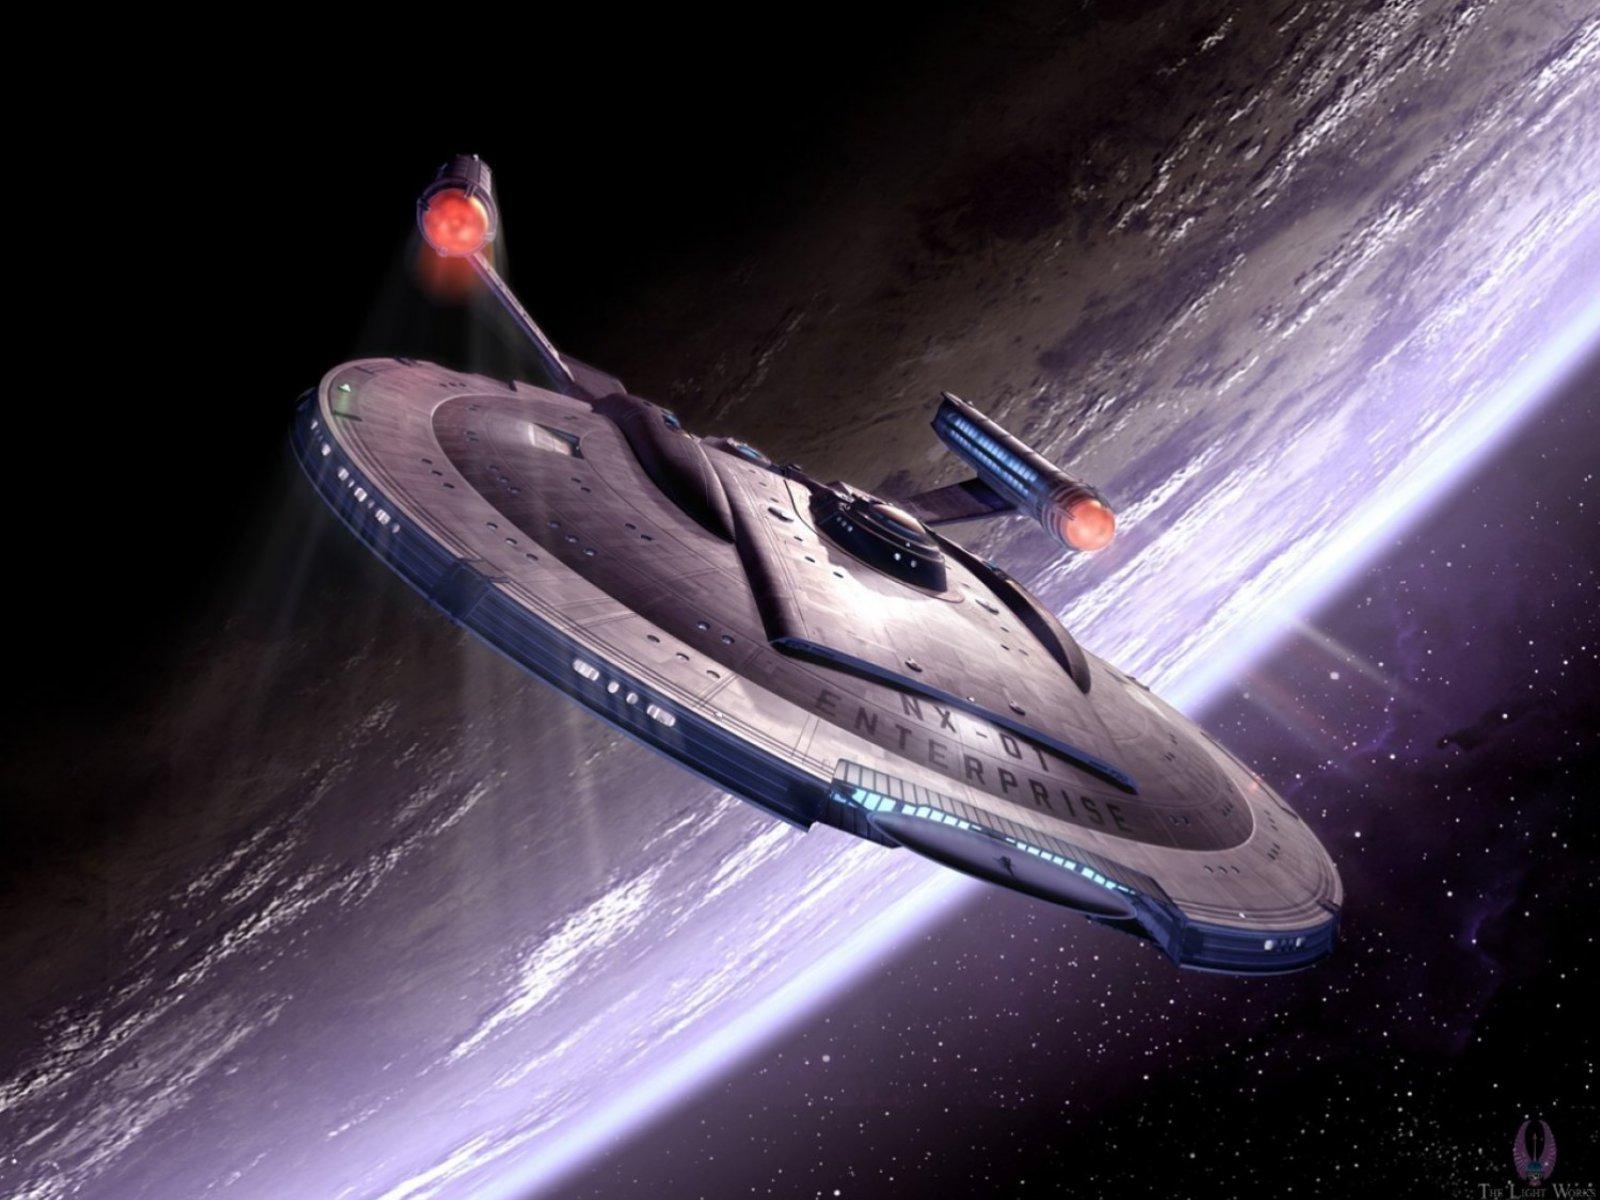 Star Trek Enterprise NX 01 starship by The Light Works 1600x1200